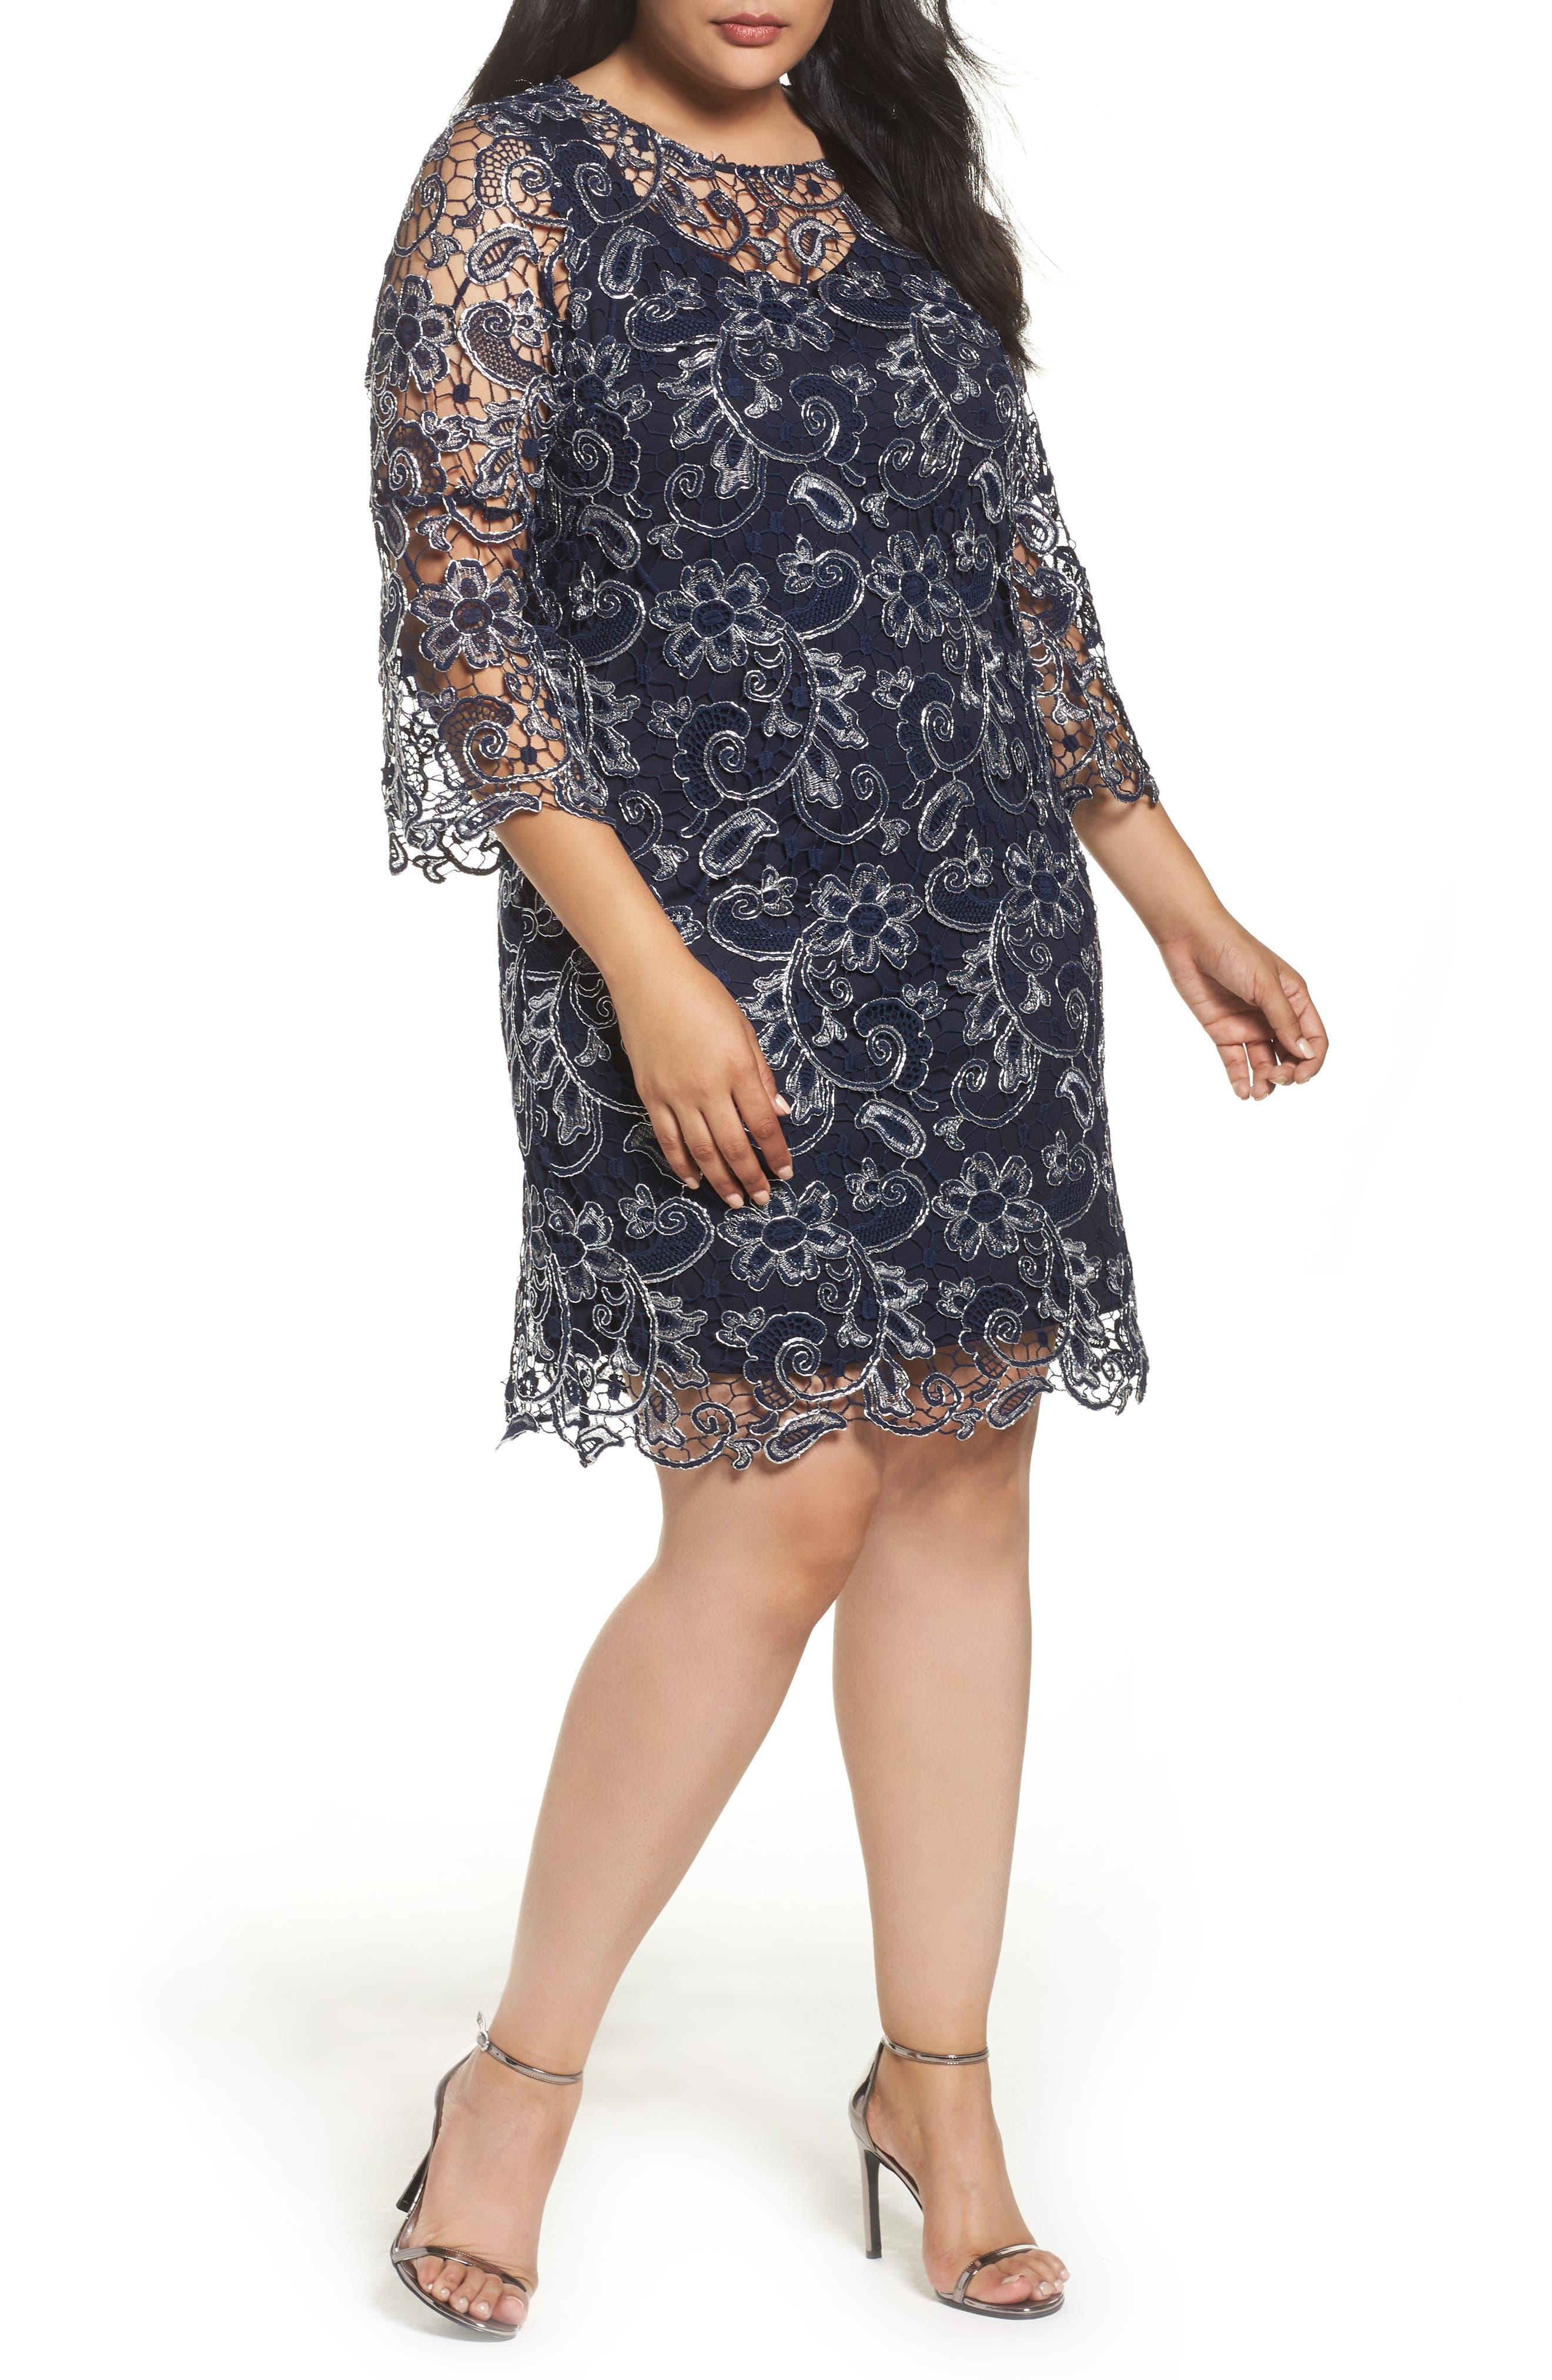 Alternate Image 1 Selected - Marina Bell Sleeve Lace Shift Dress (Plus Size)